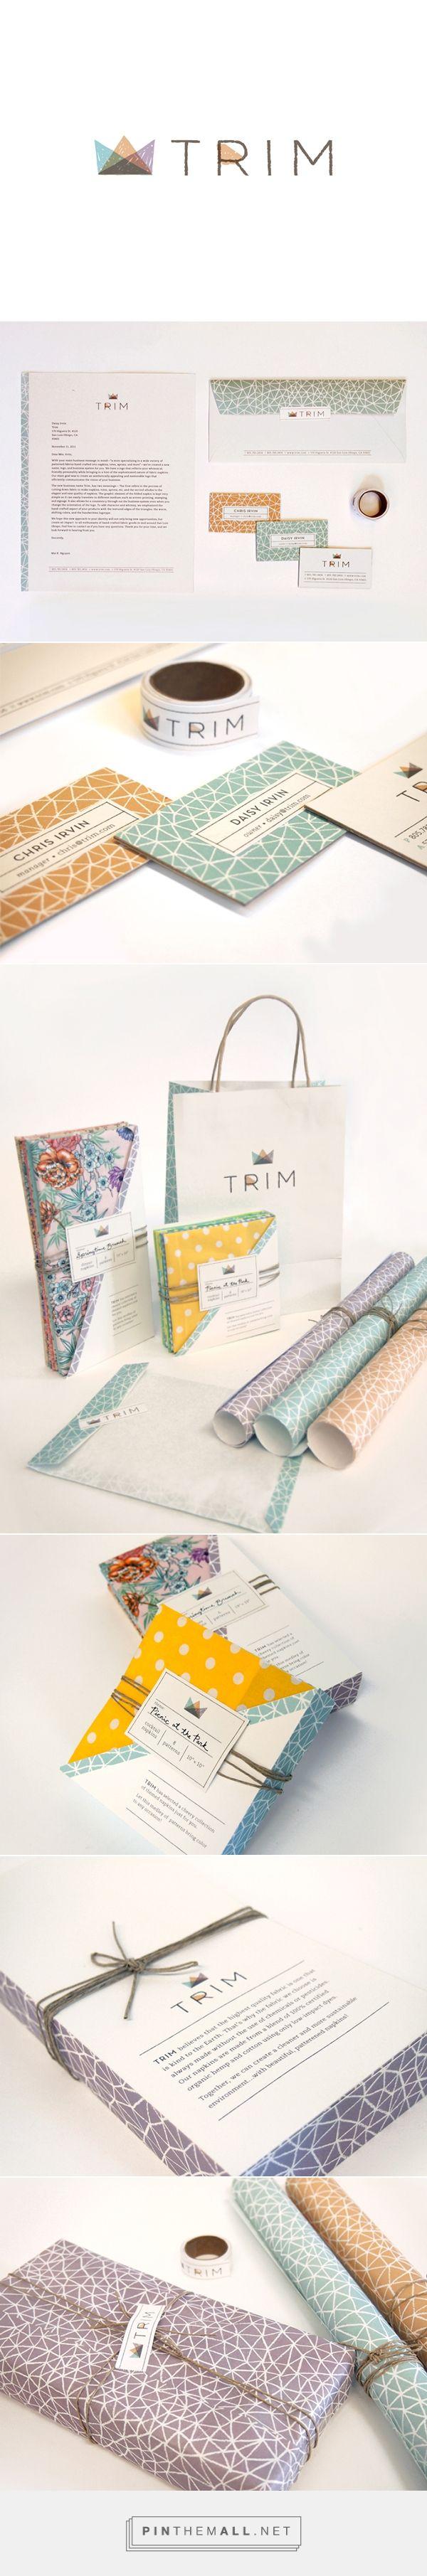 Trim Branding on Behance